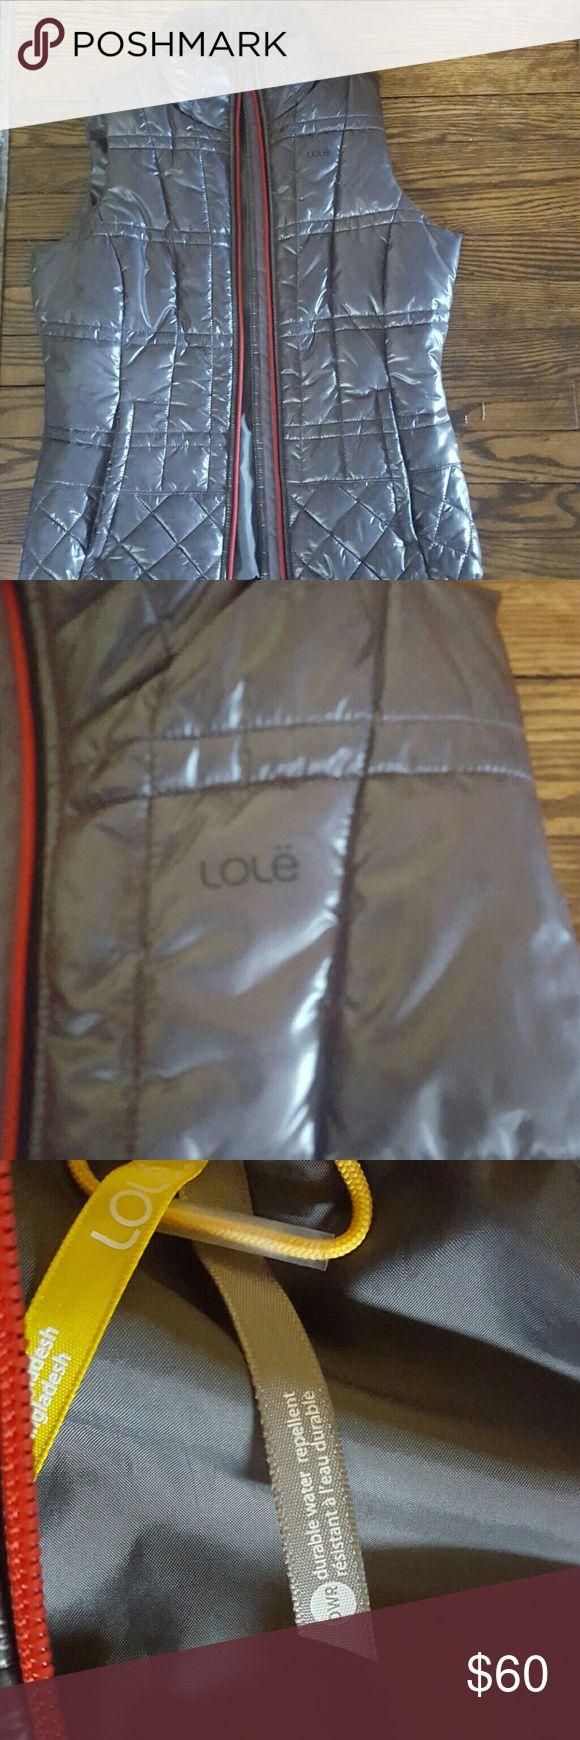 LOLE pewter colored vest Red zipper,2 pocket zip front vest Lole Jackets & Coats Vests